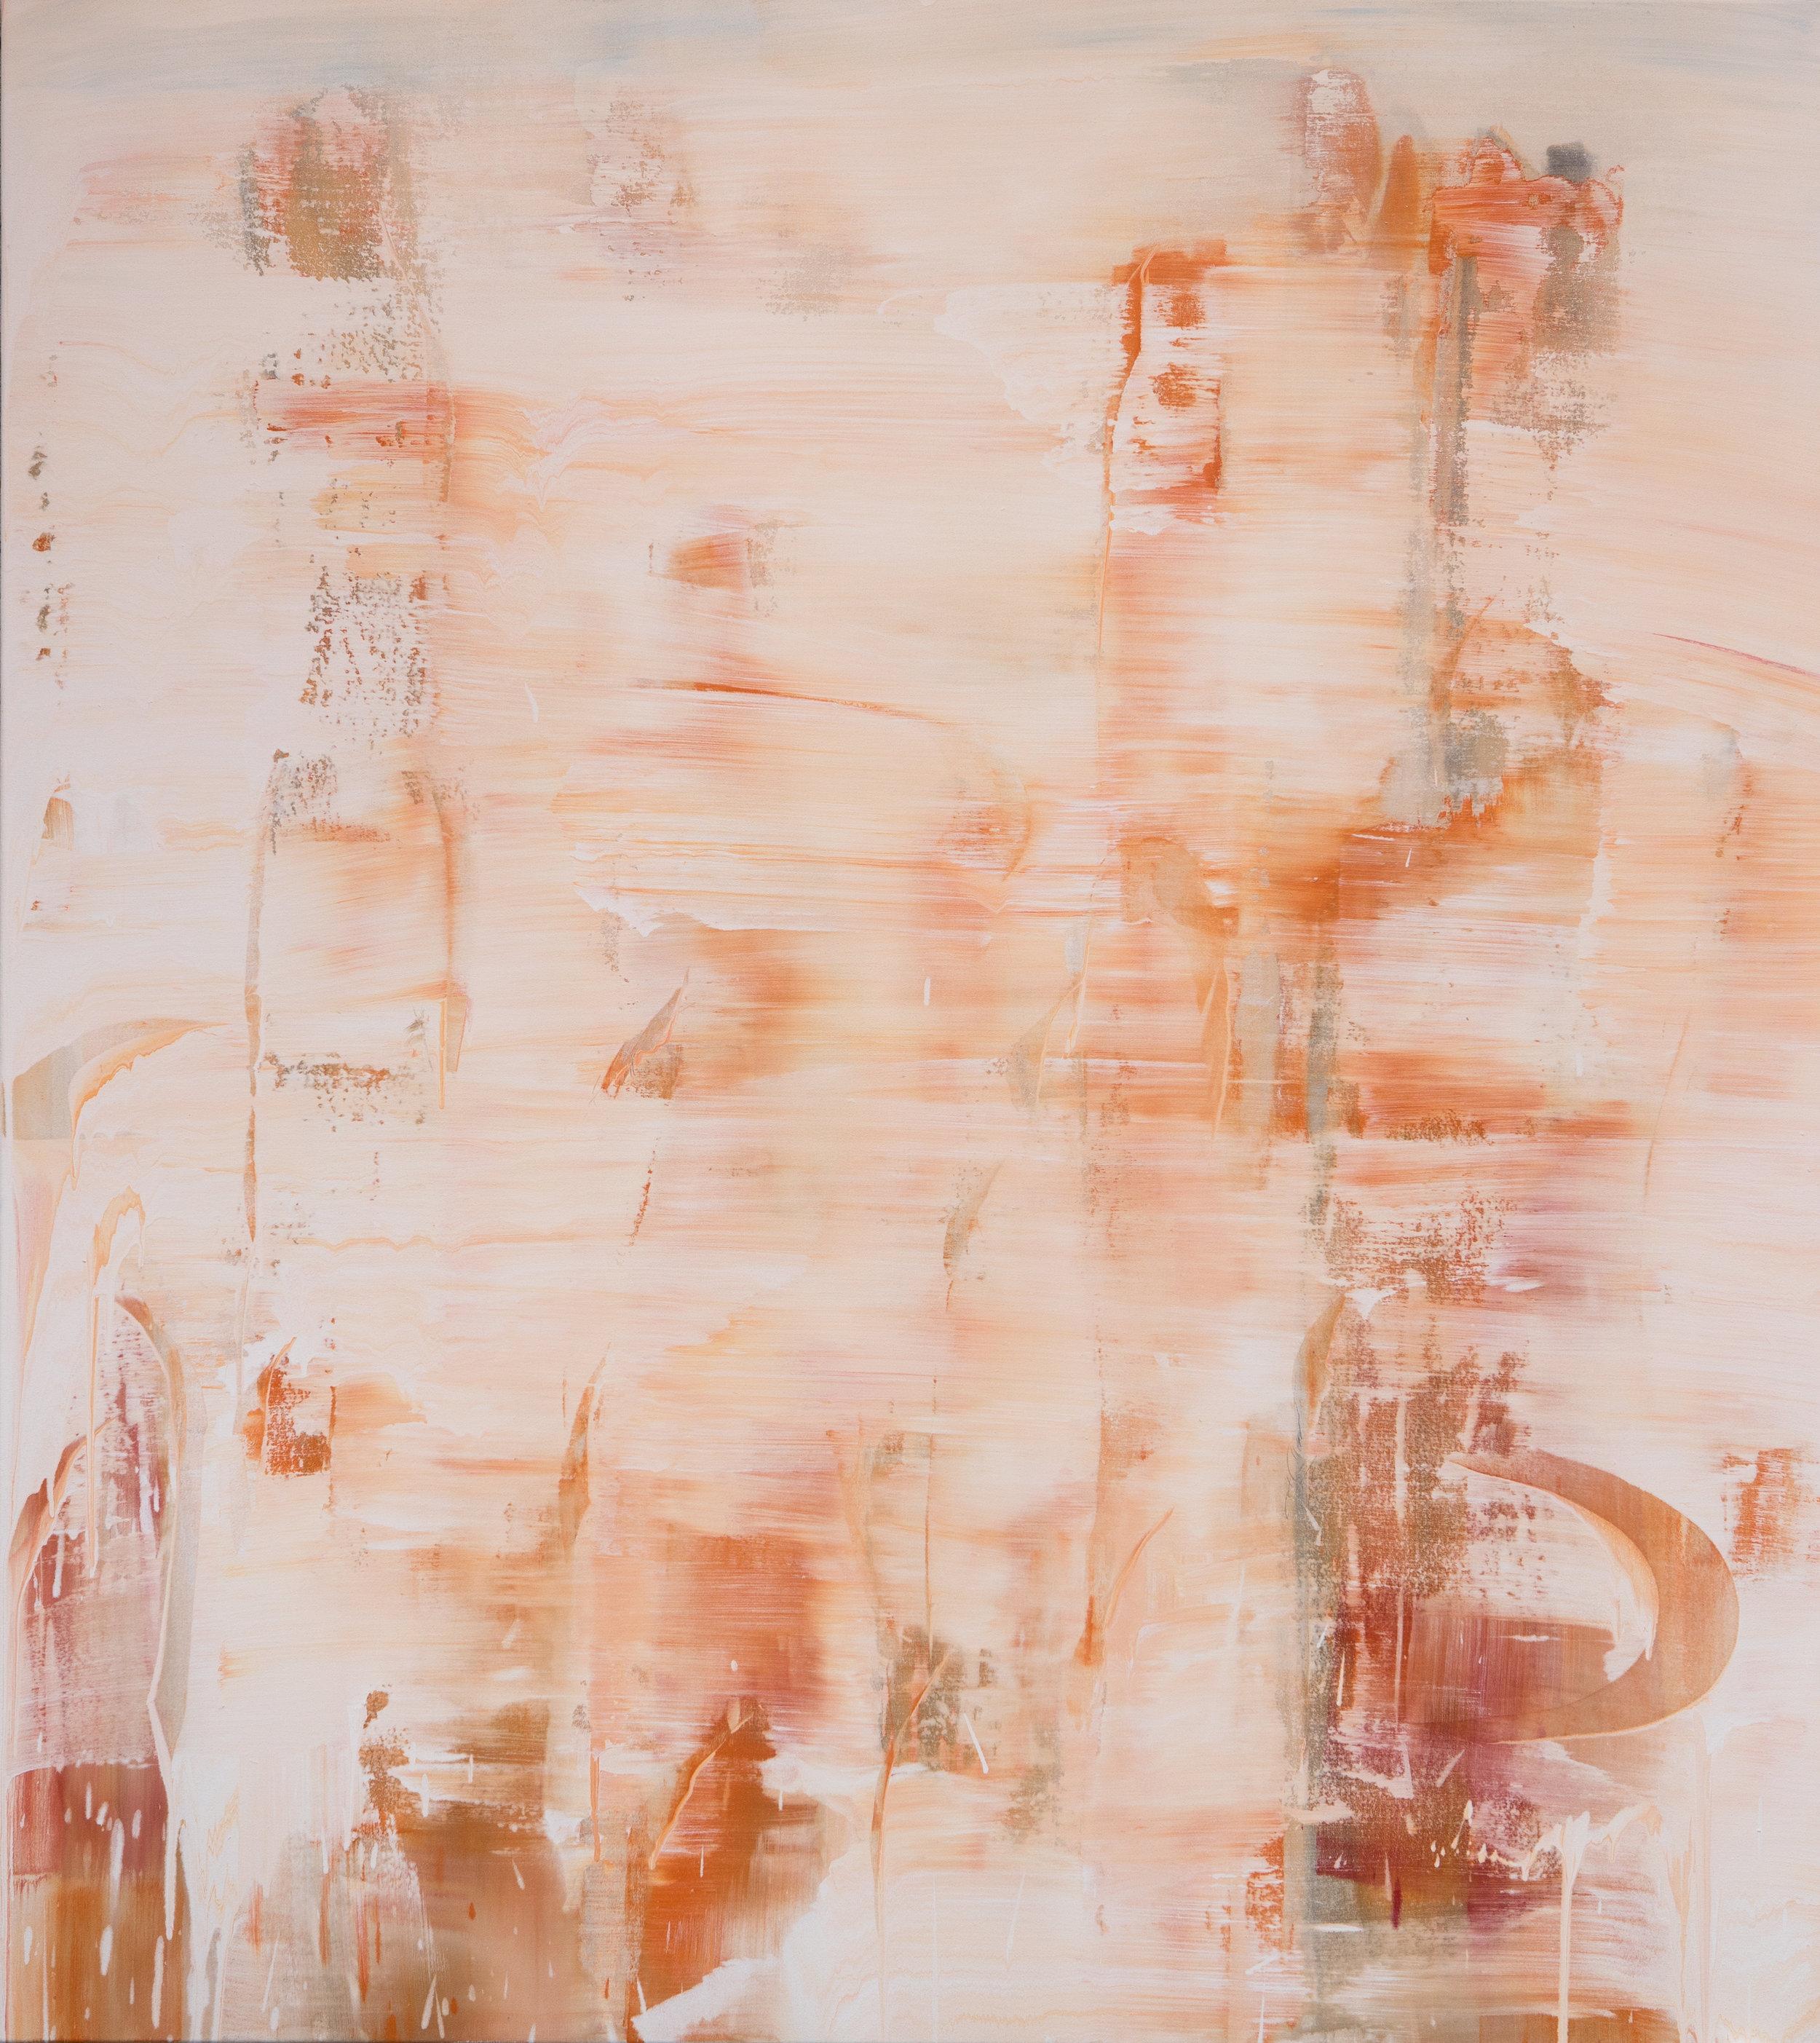 Veiled Landscape-Zahnjiajie 1, 2018, acrylic pigment on canvas, 189 x 169 cm.jpg